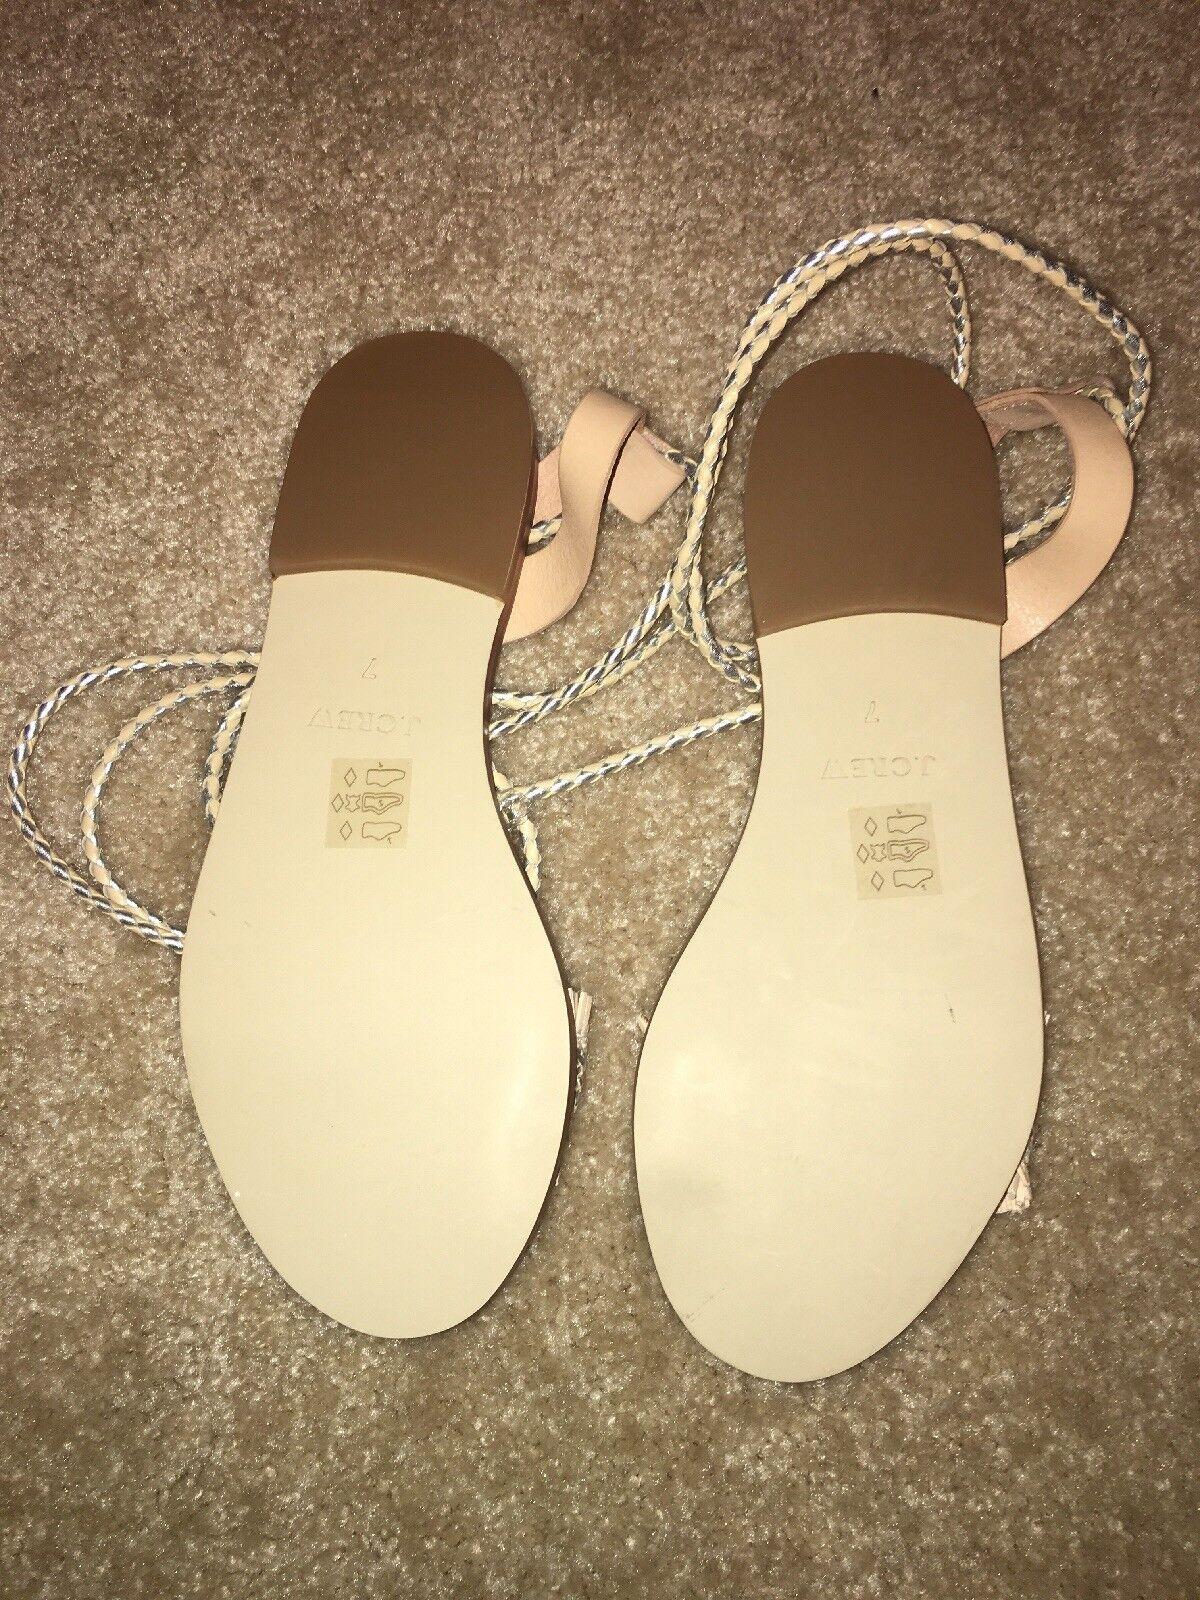 J.Crew Raffia Ankle-Tie Ankle-Tie Ankle-Tie Sandals Metallic Silver Beige bluesh Size 7 0578c8